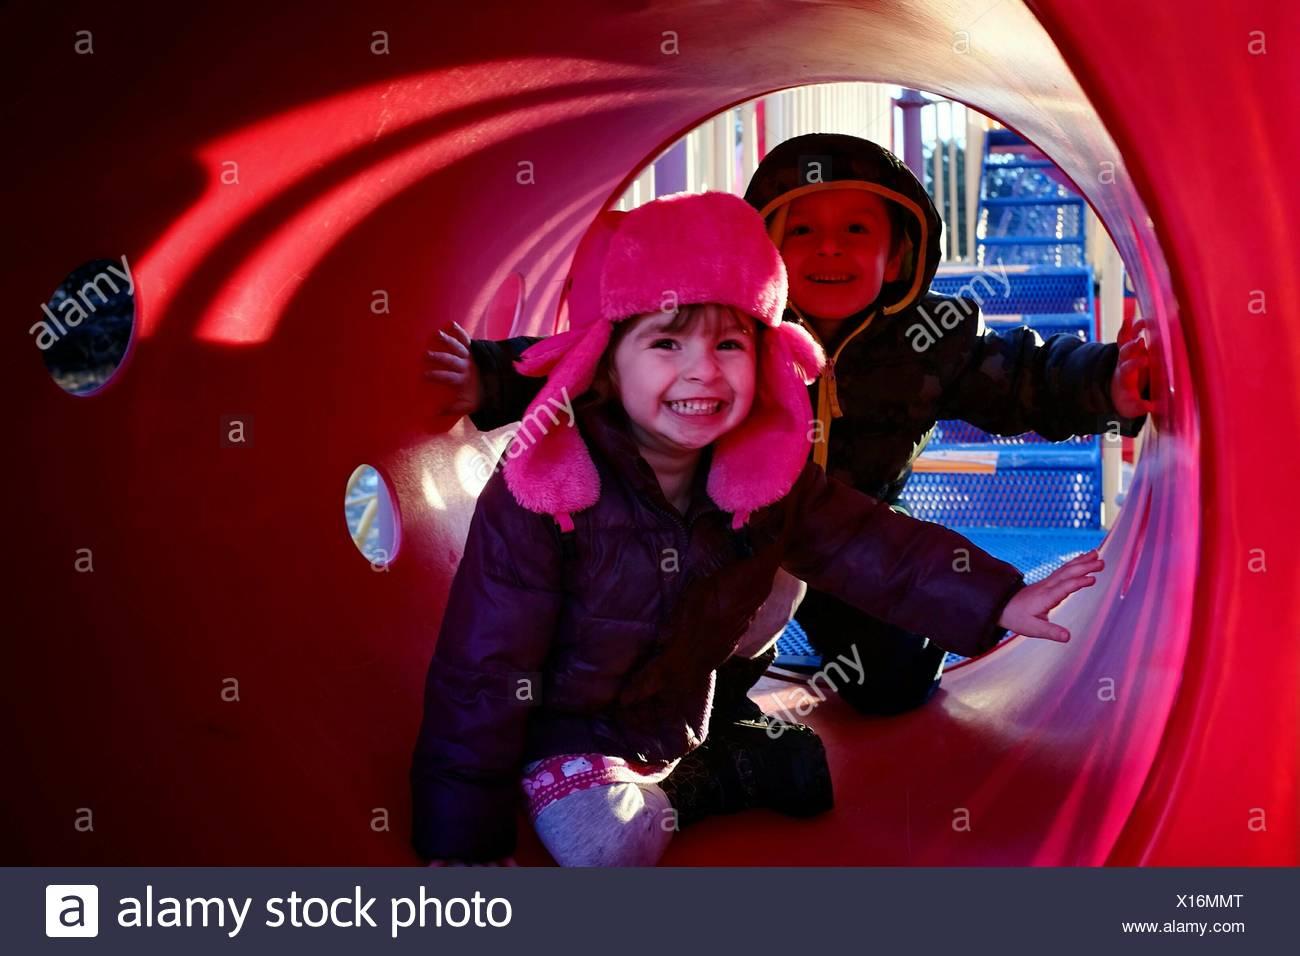 Kinder im Spielplatz-Tunnel Stockbild